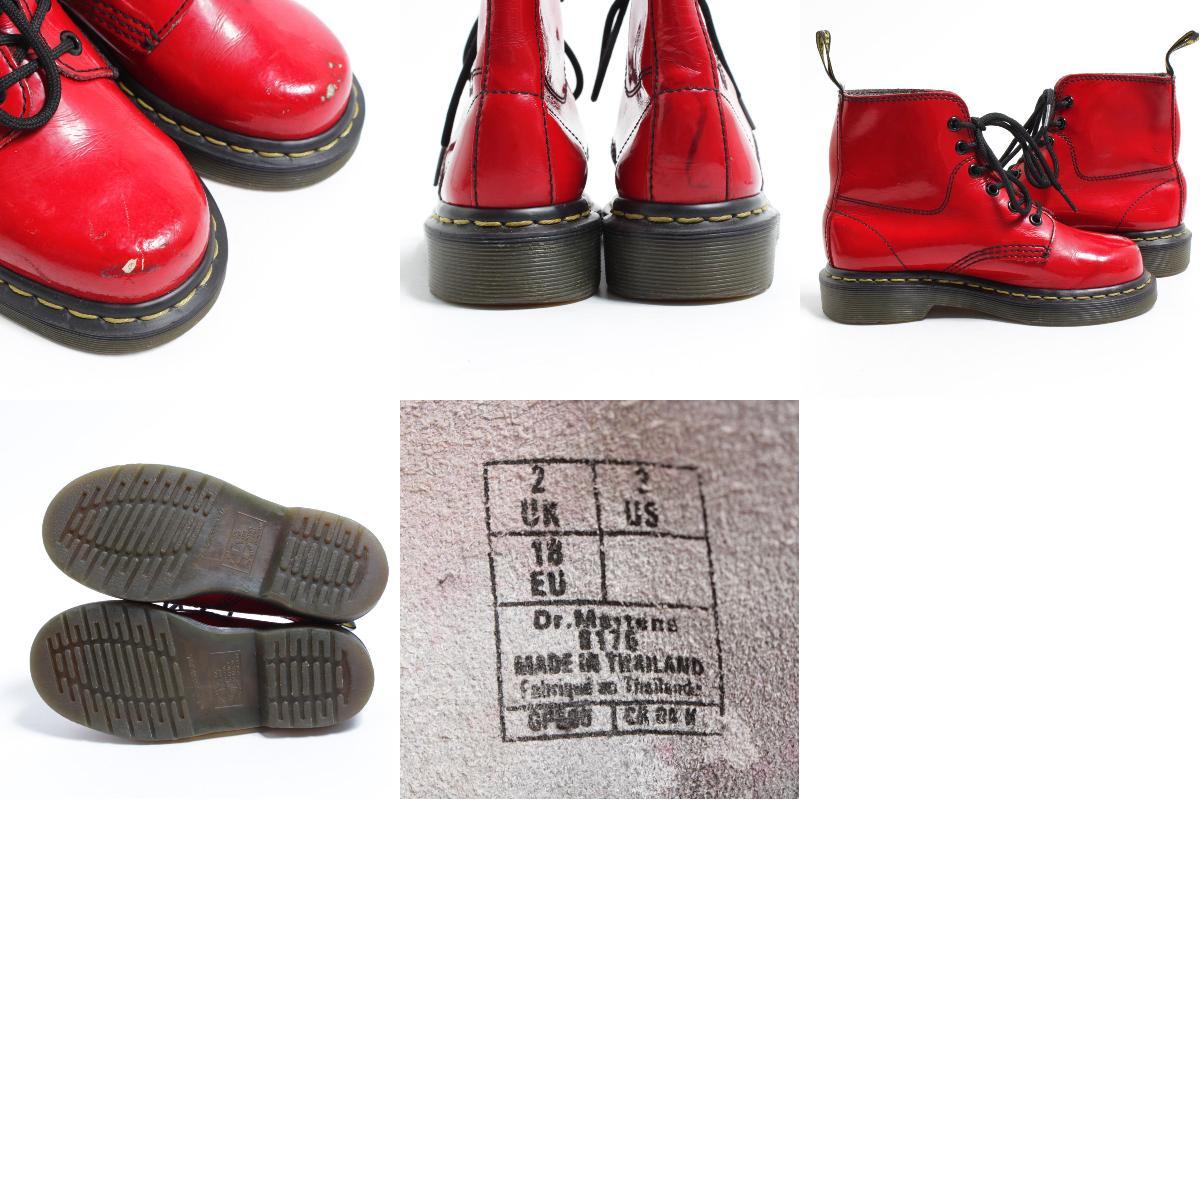 Doctor Martin Dr.Martens 6 hall boots UK2 Lady's 20.5cm /bon1006